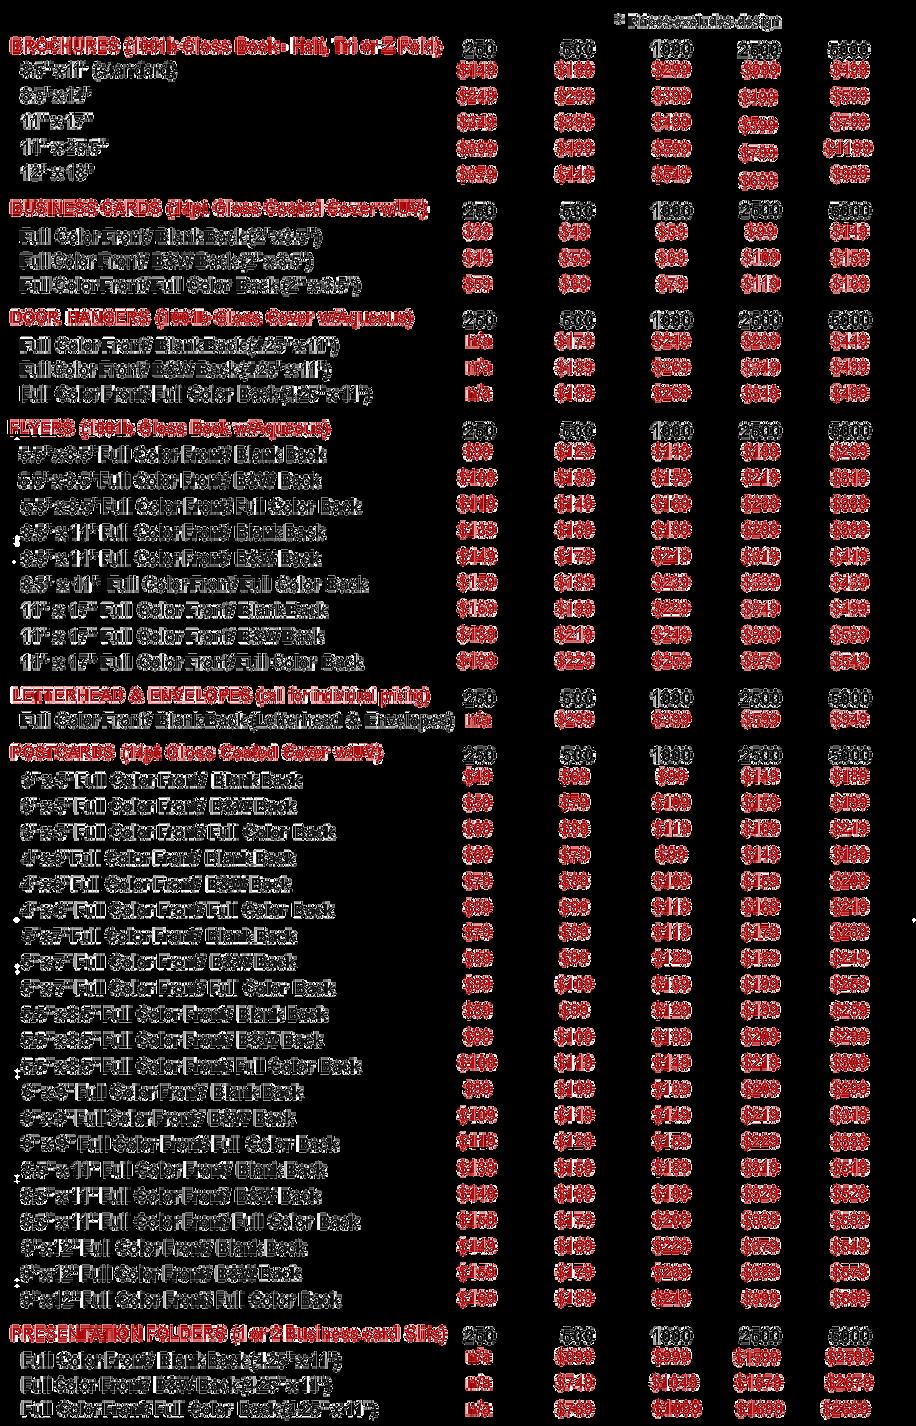 LNR print-pricing-affordable Prices 0.pn